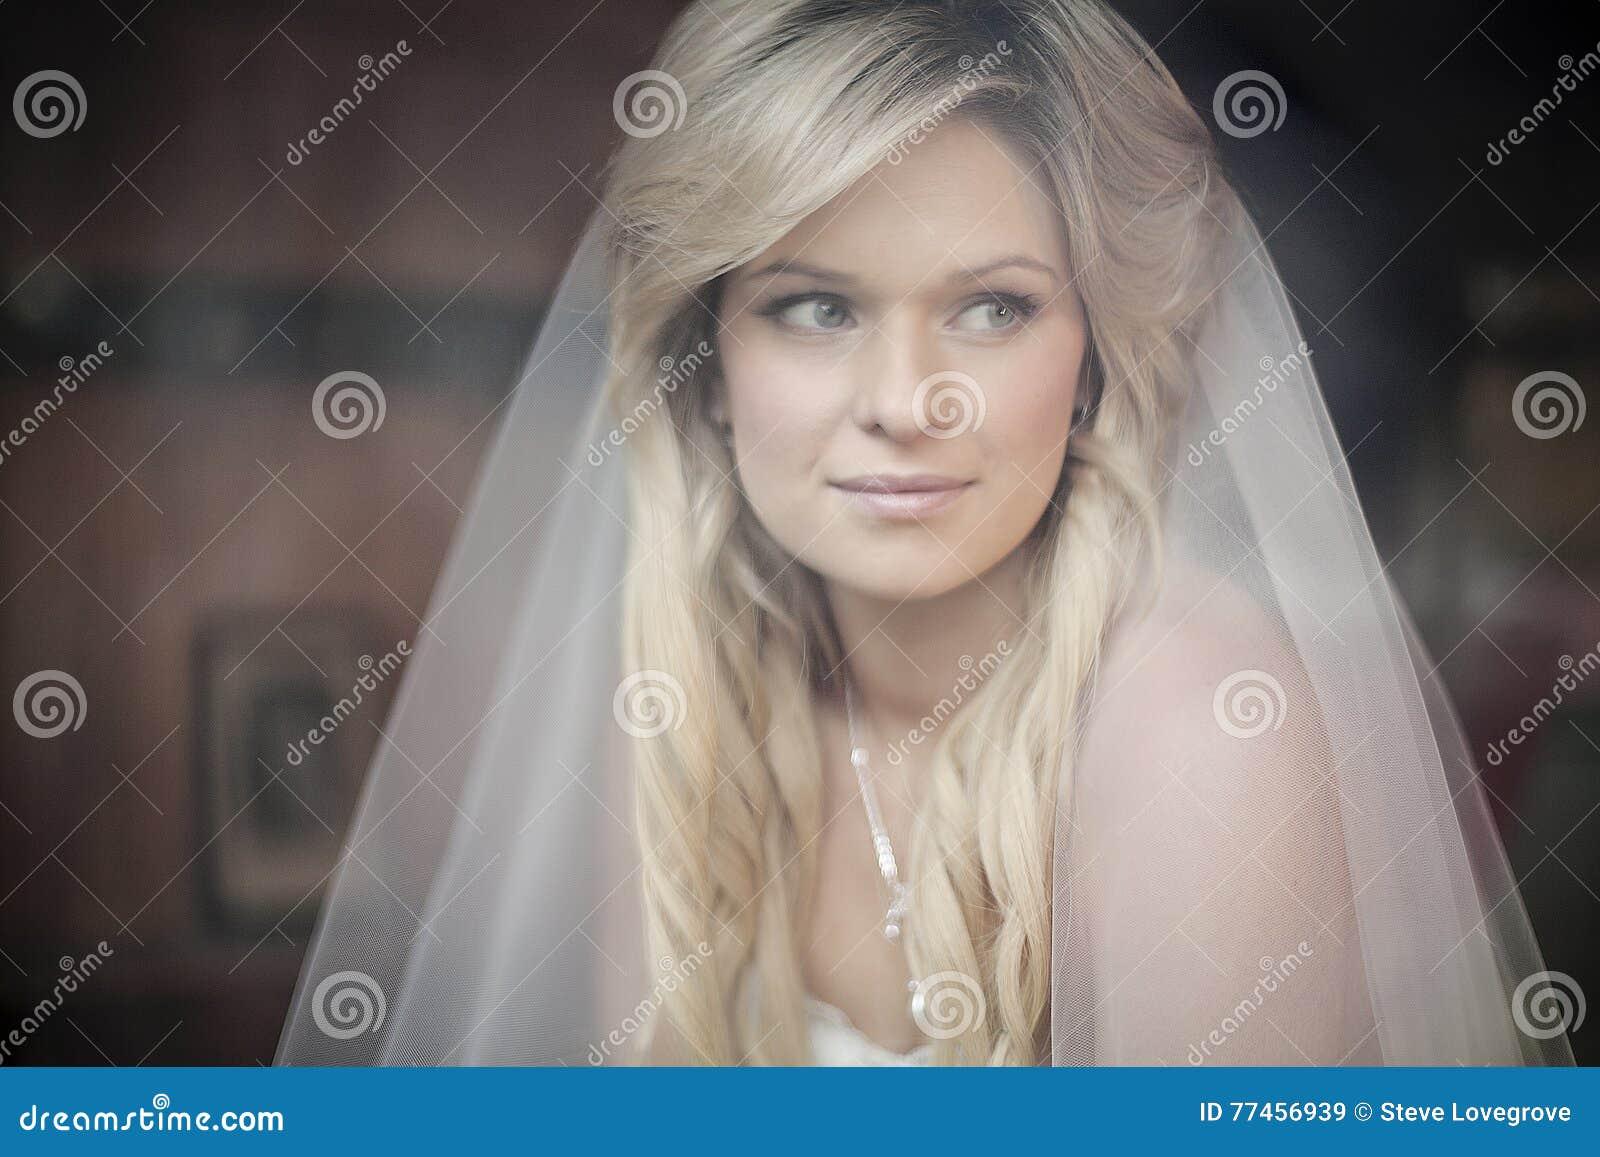 Soft portrait of female